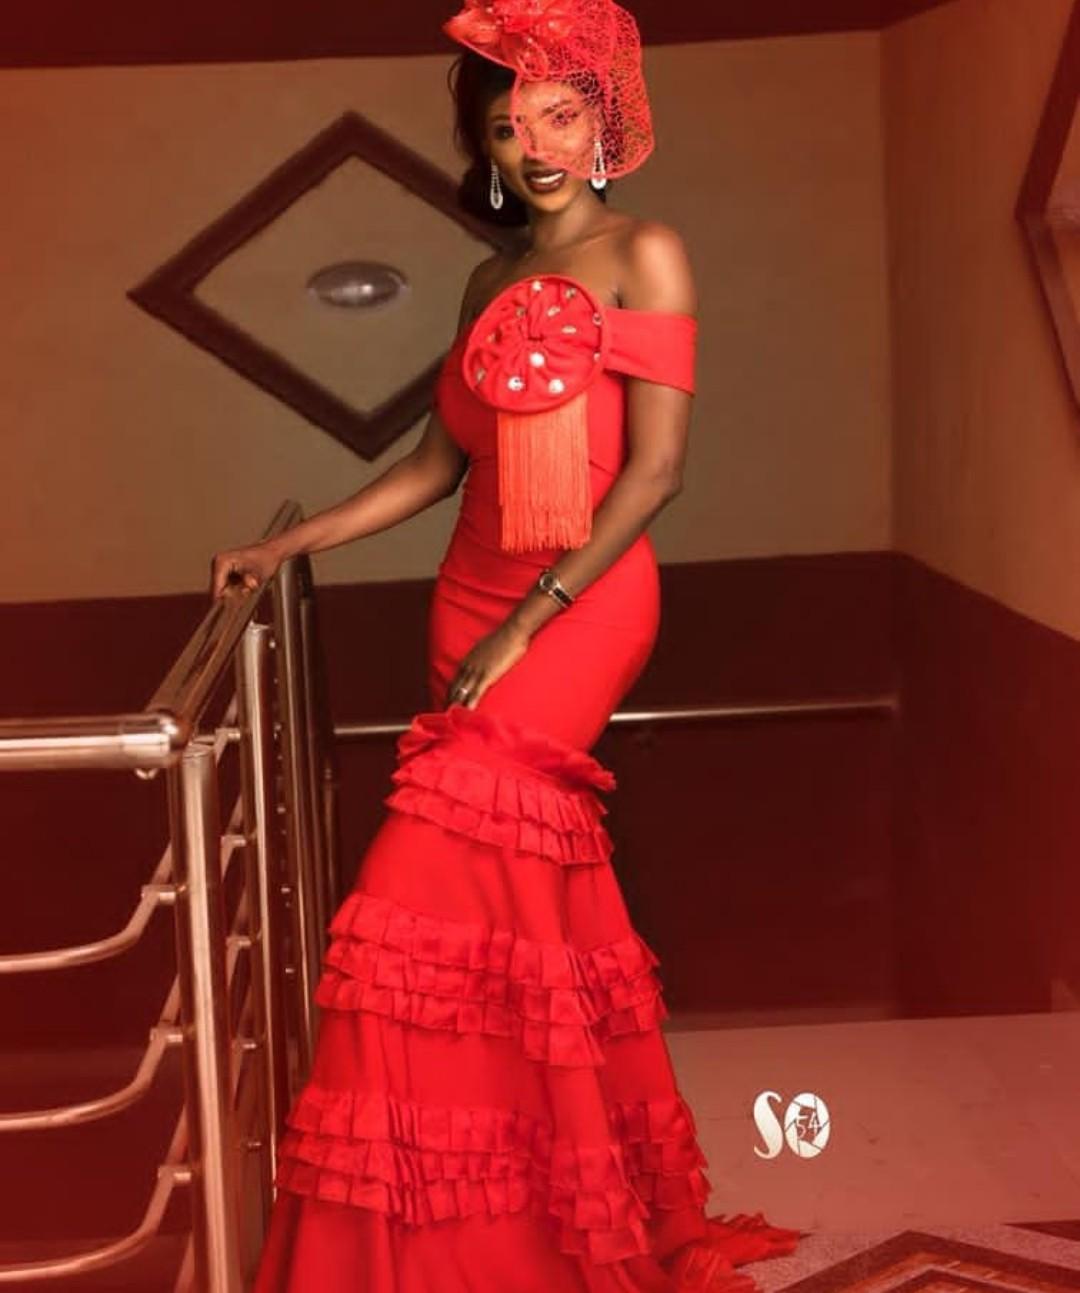 FRESH ANKARA WEDDING DRESS  2020 FASHIONABLE AND SIMPLE STYLES 2